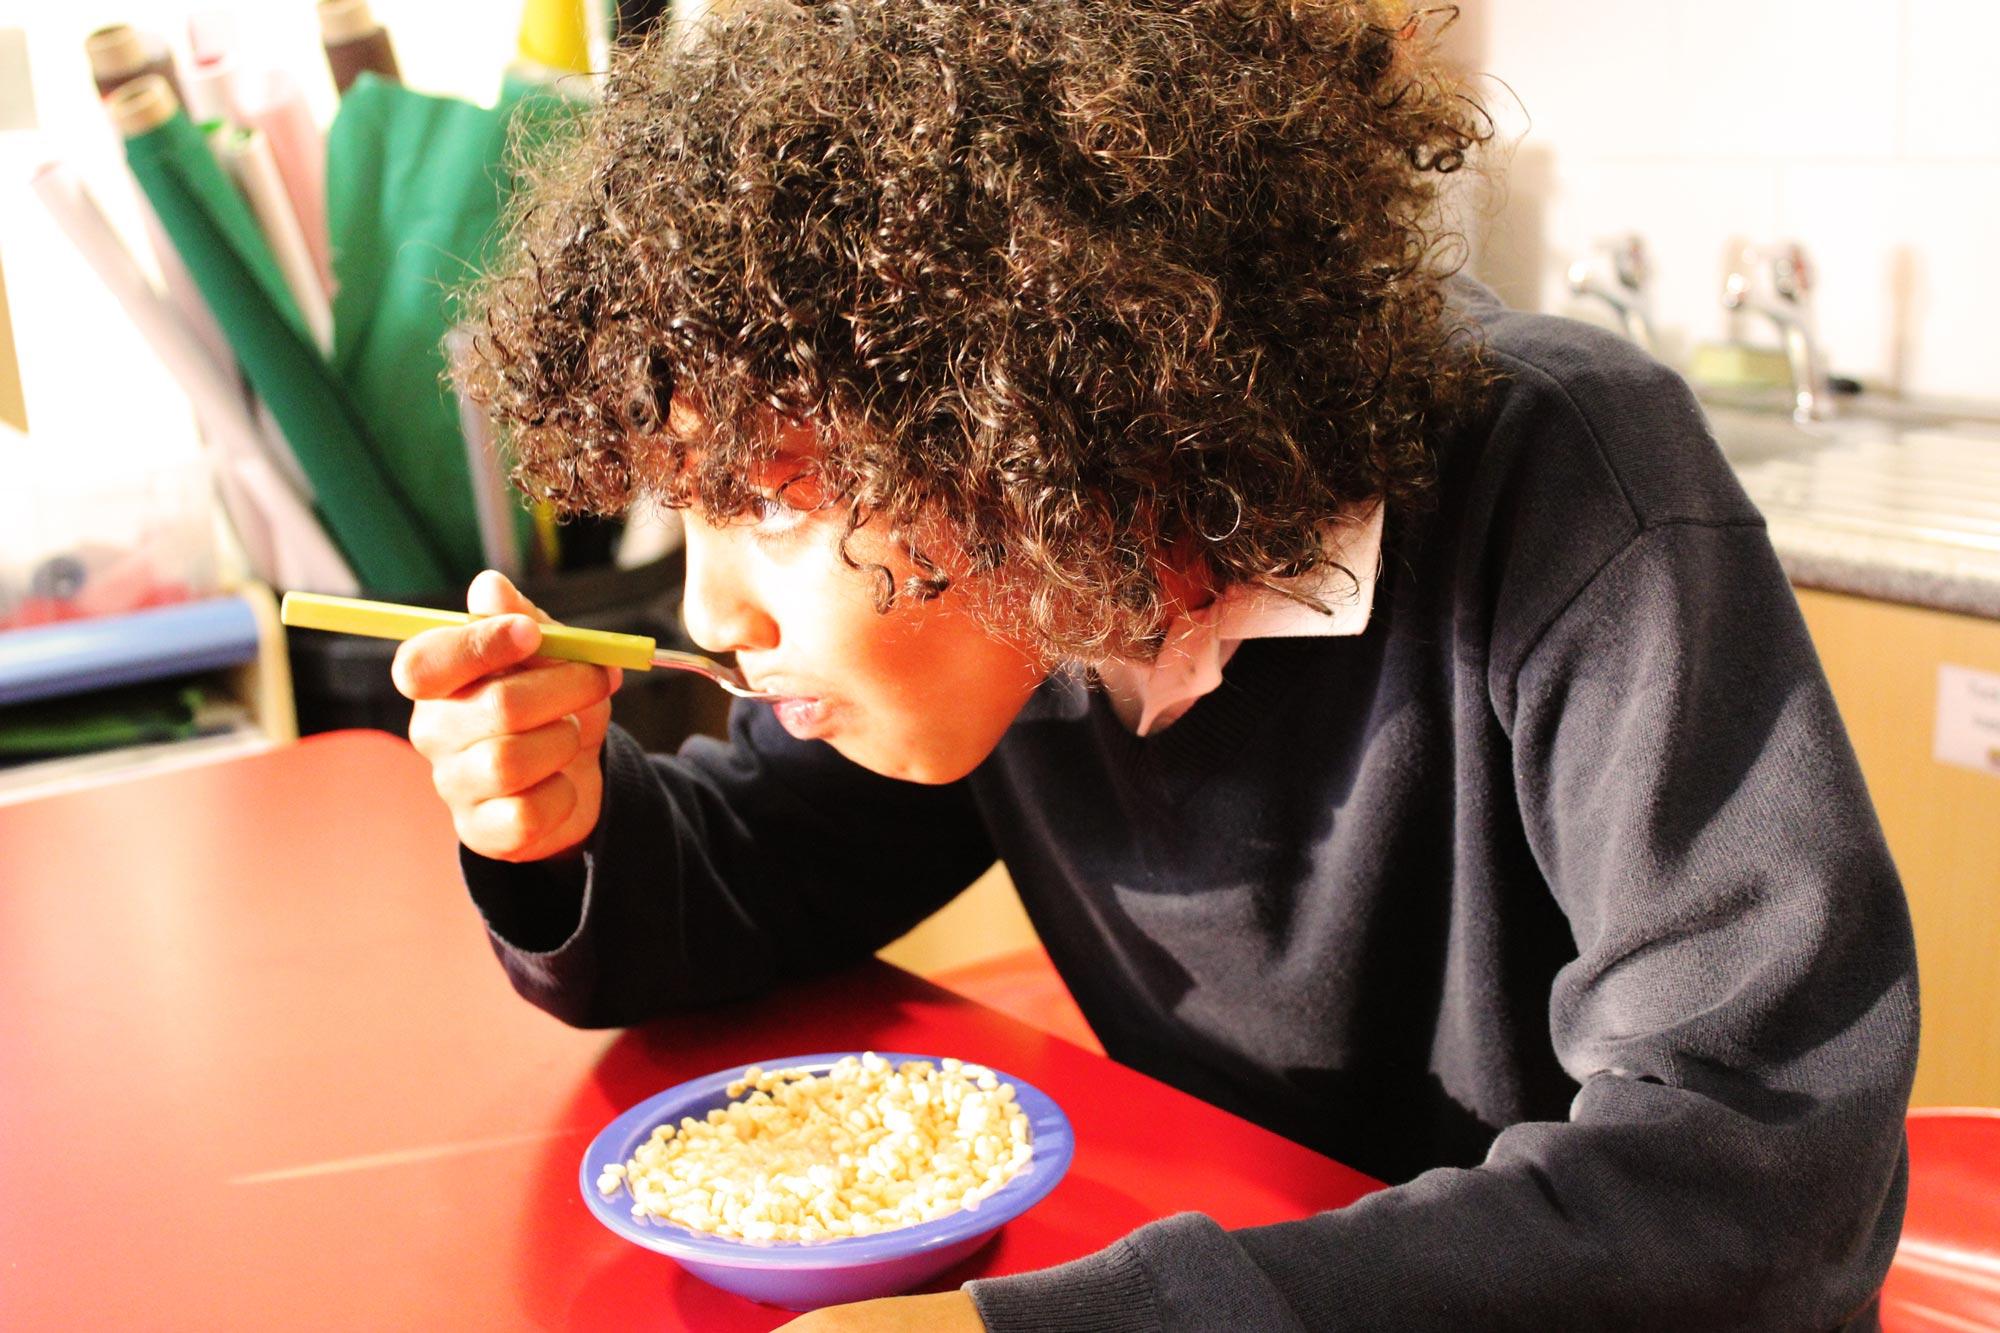 breakfast-club-eating-cereal